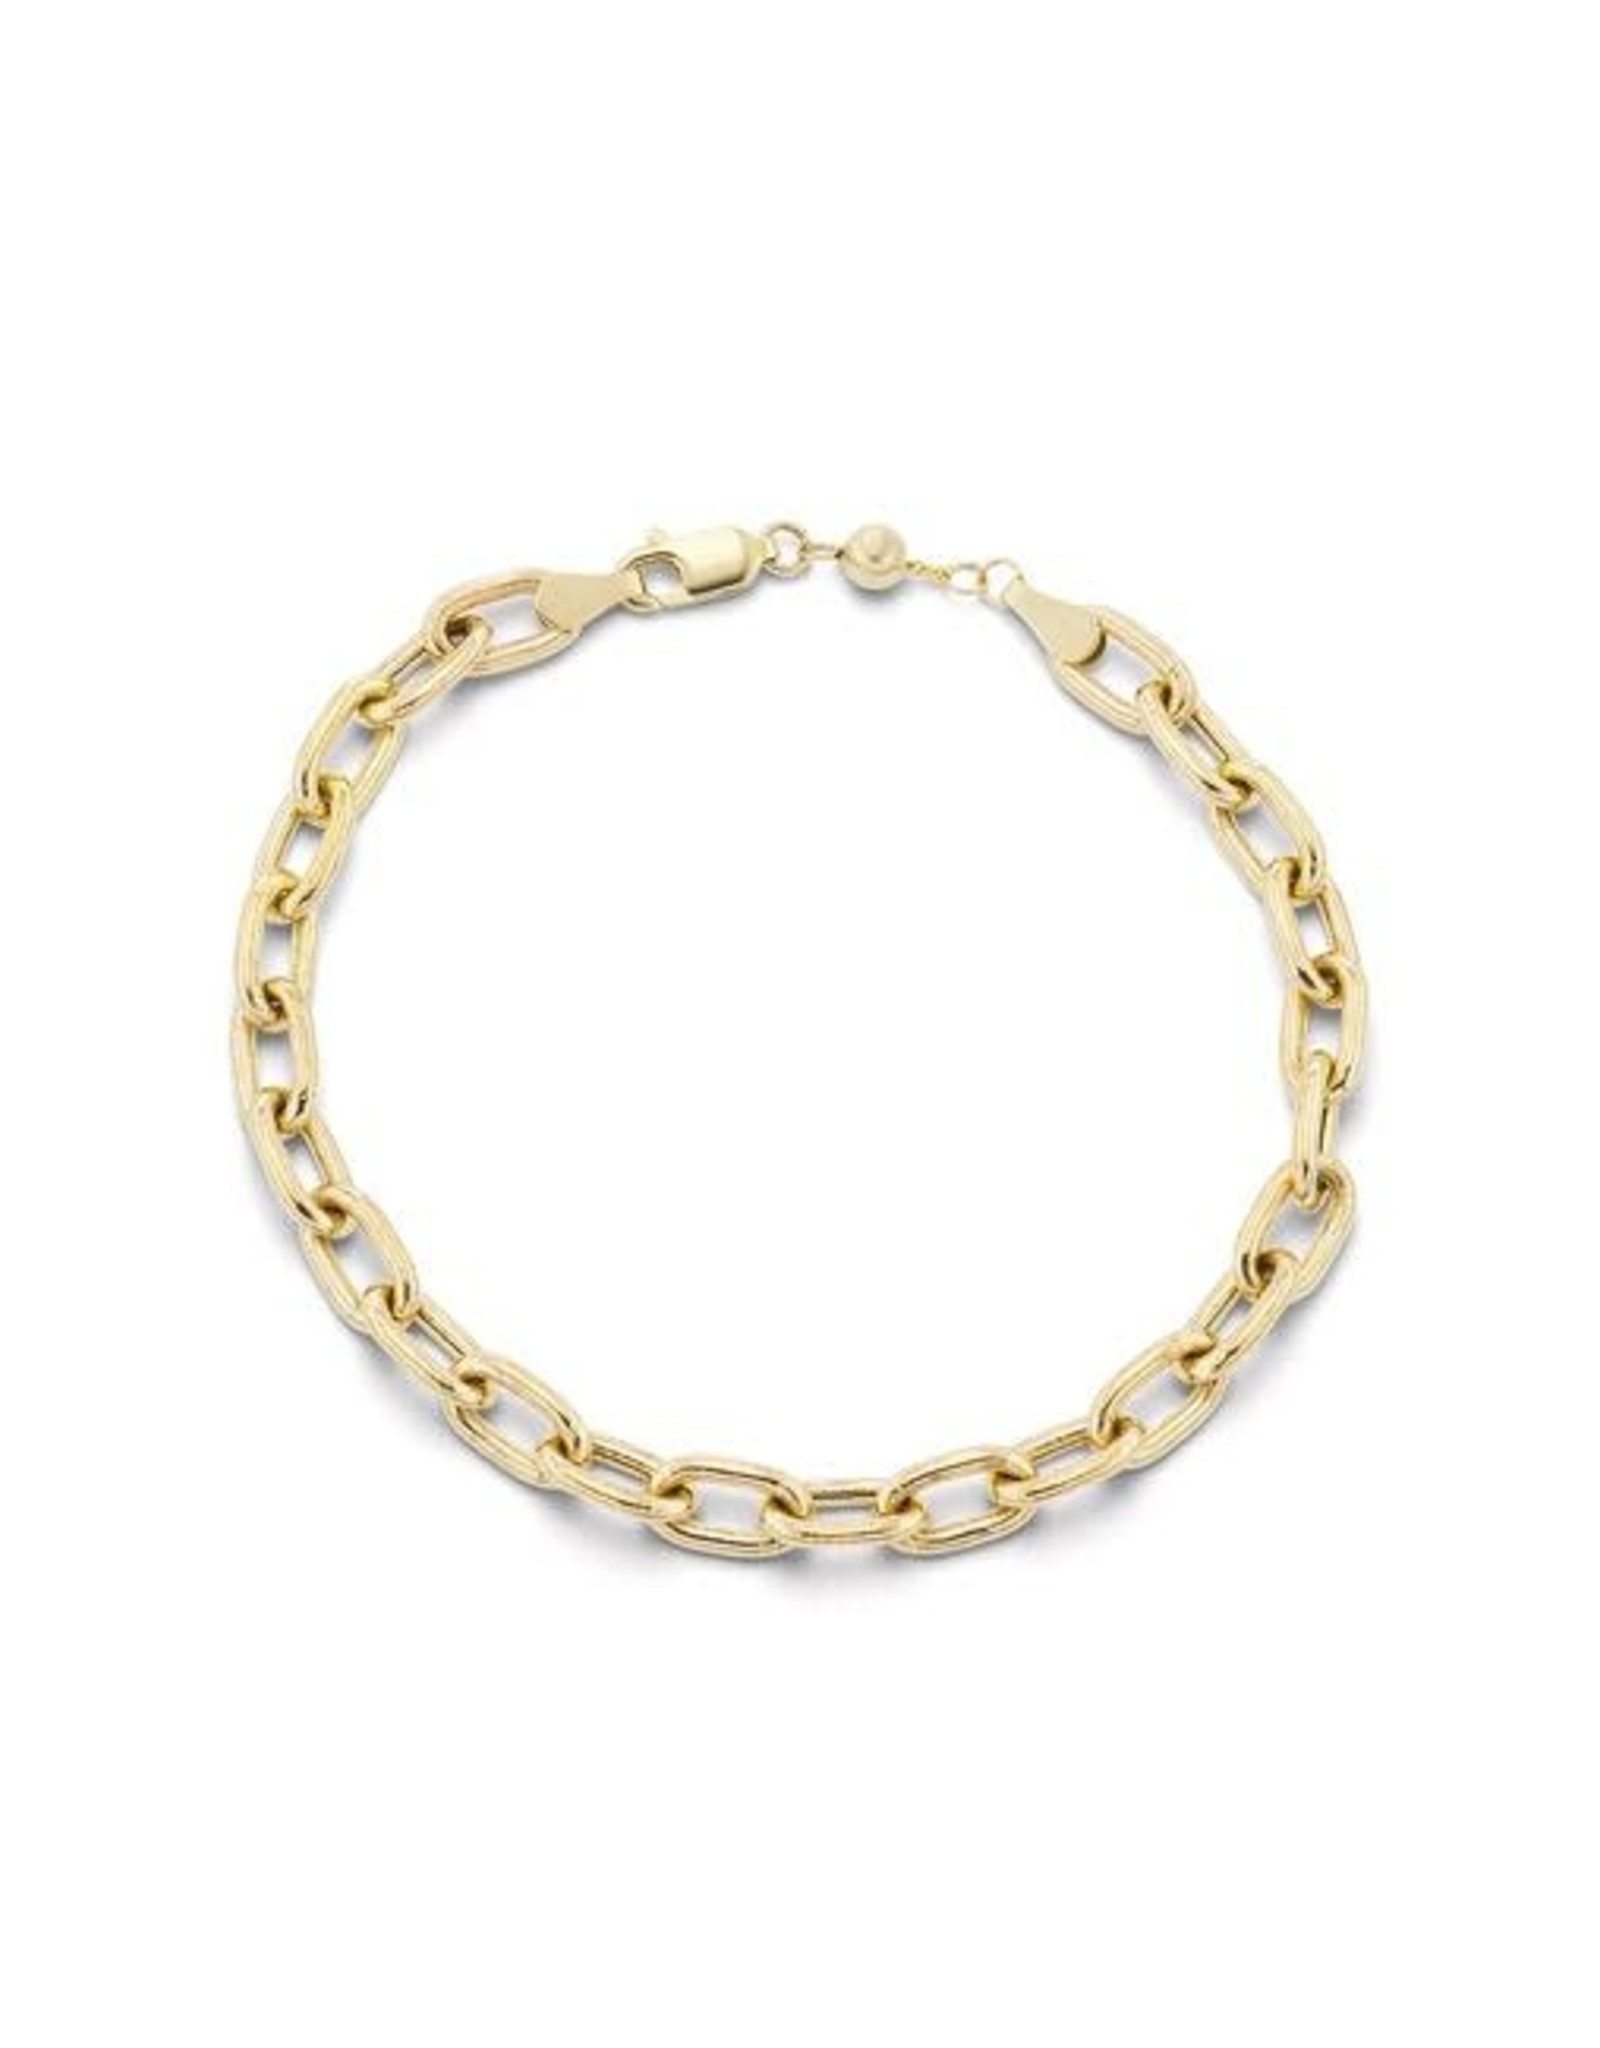 KBH Jewels Thick Elongated Link Bracelet